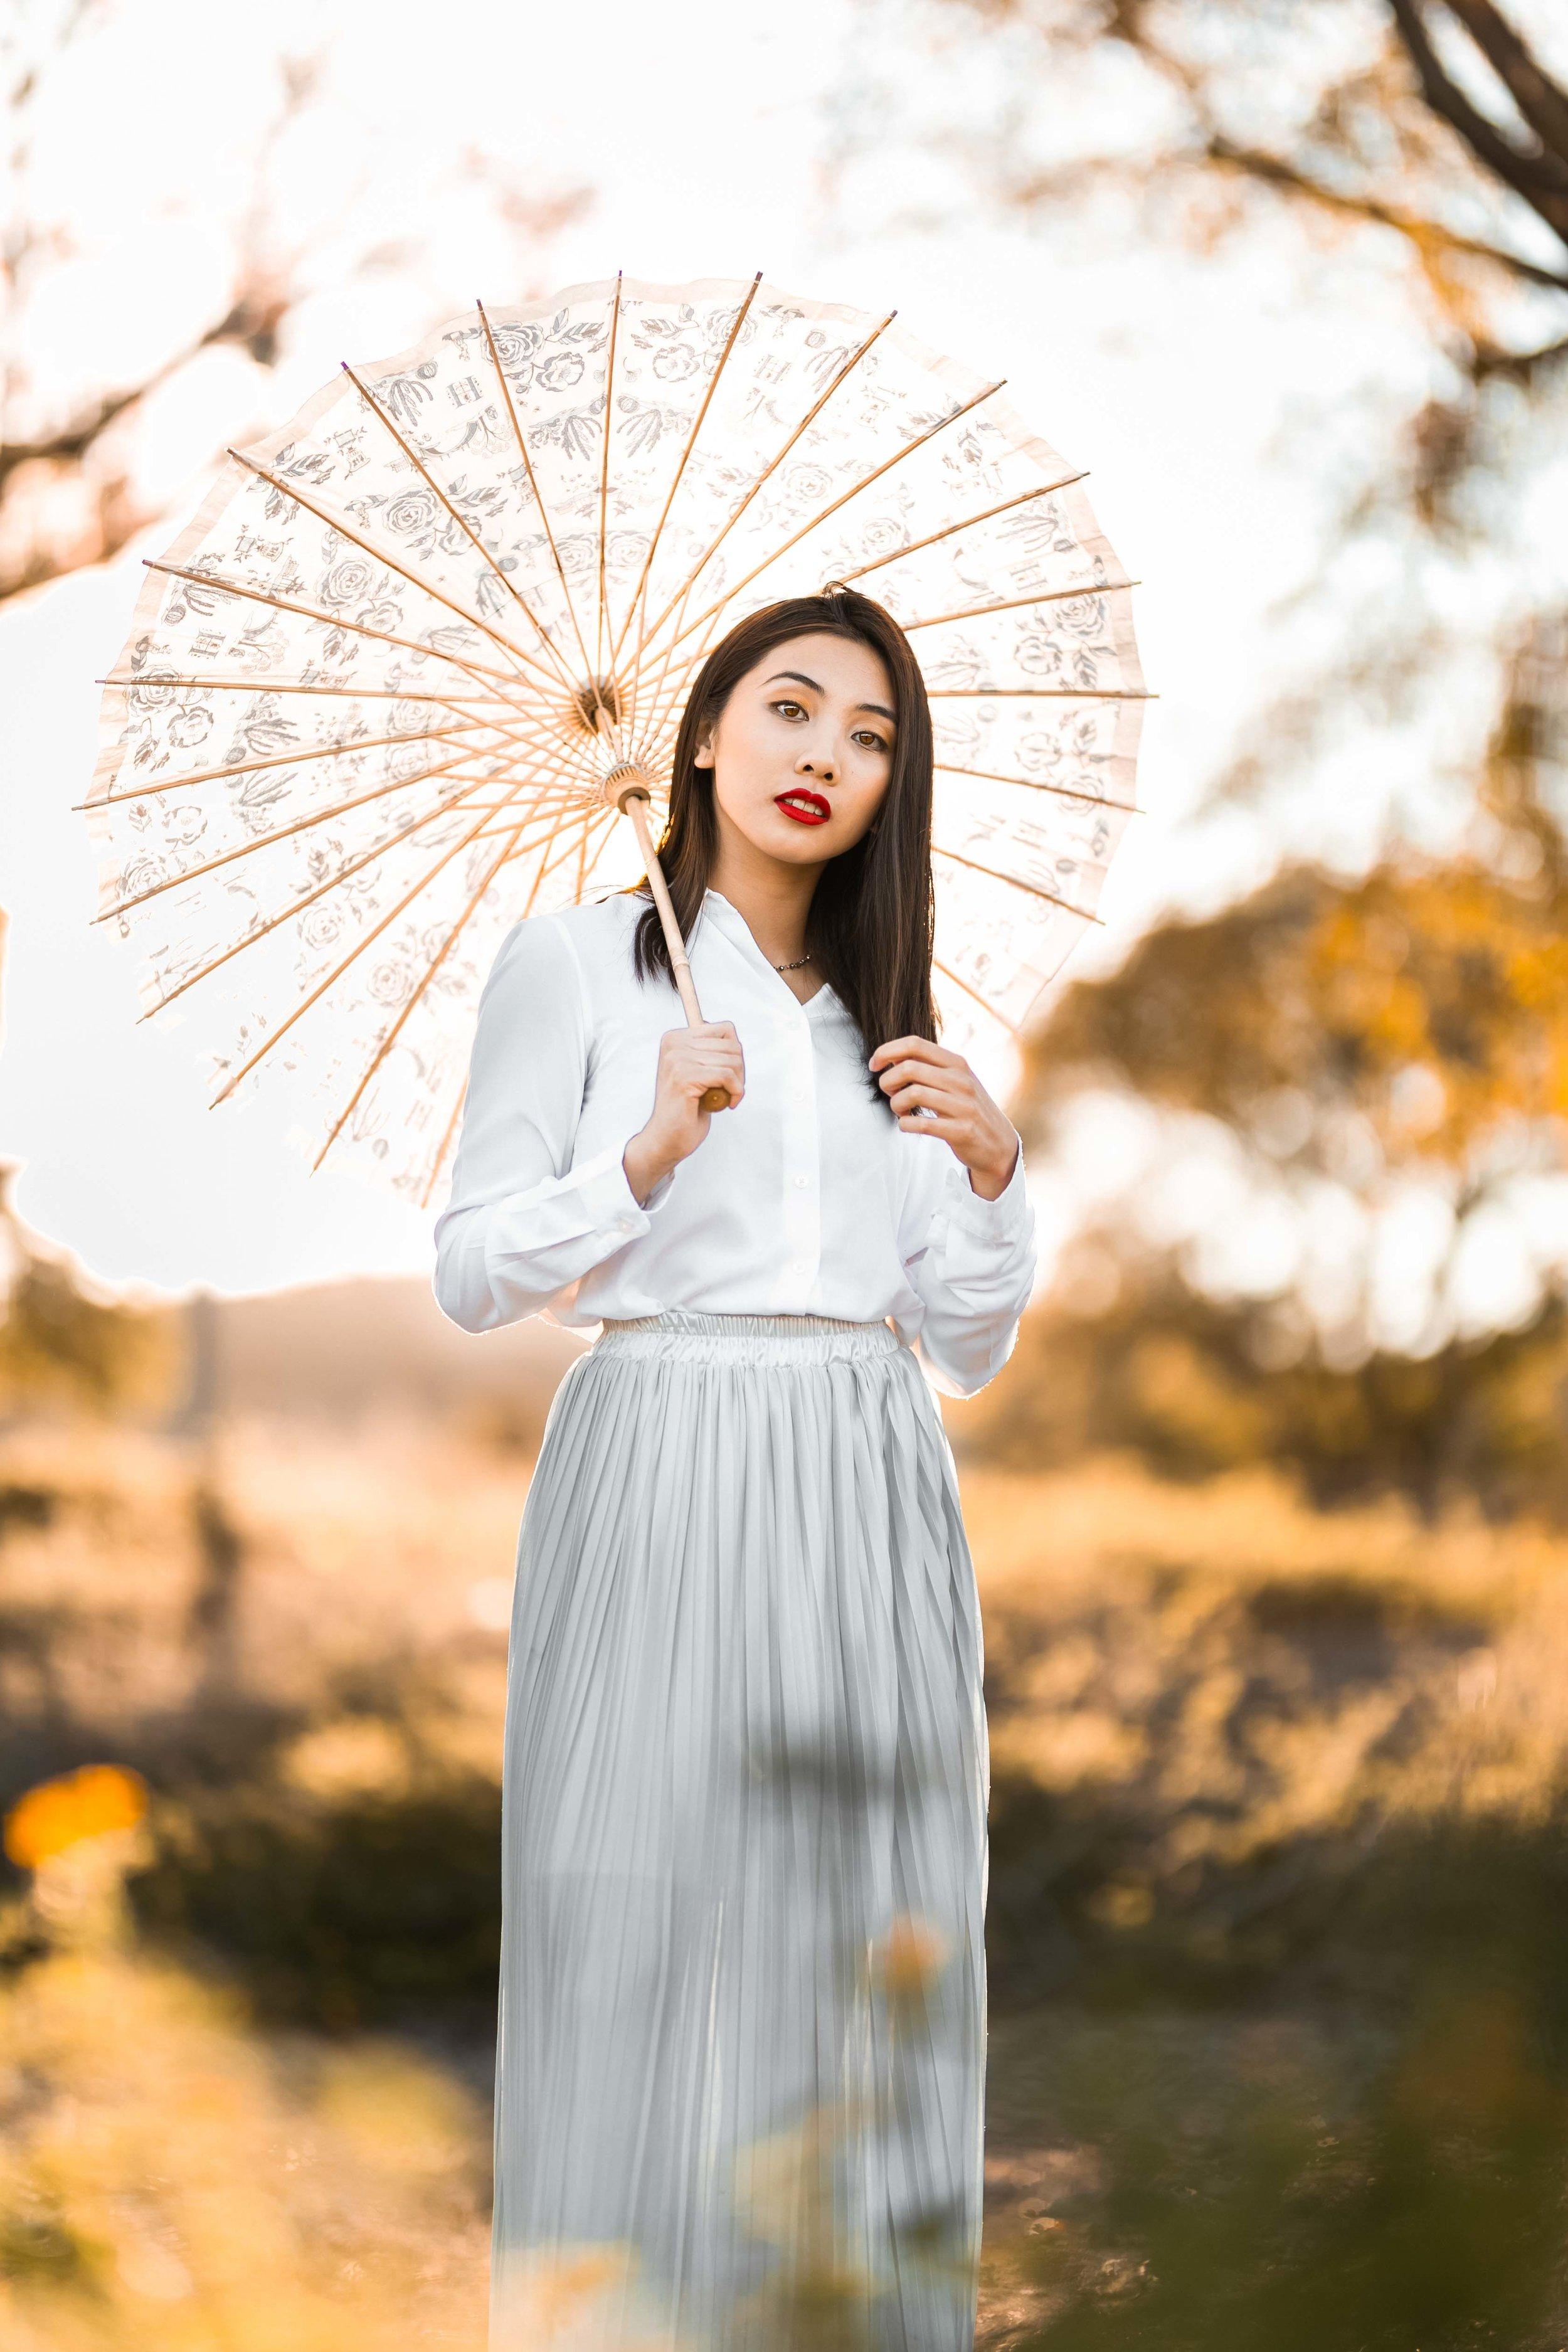 moody_portraiture_joshua_chun_photography.JPG